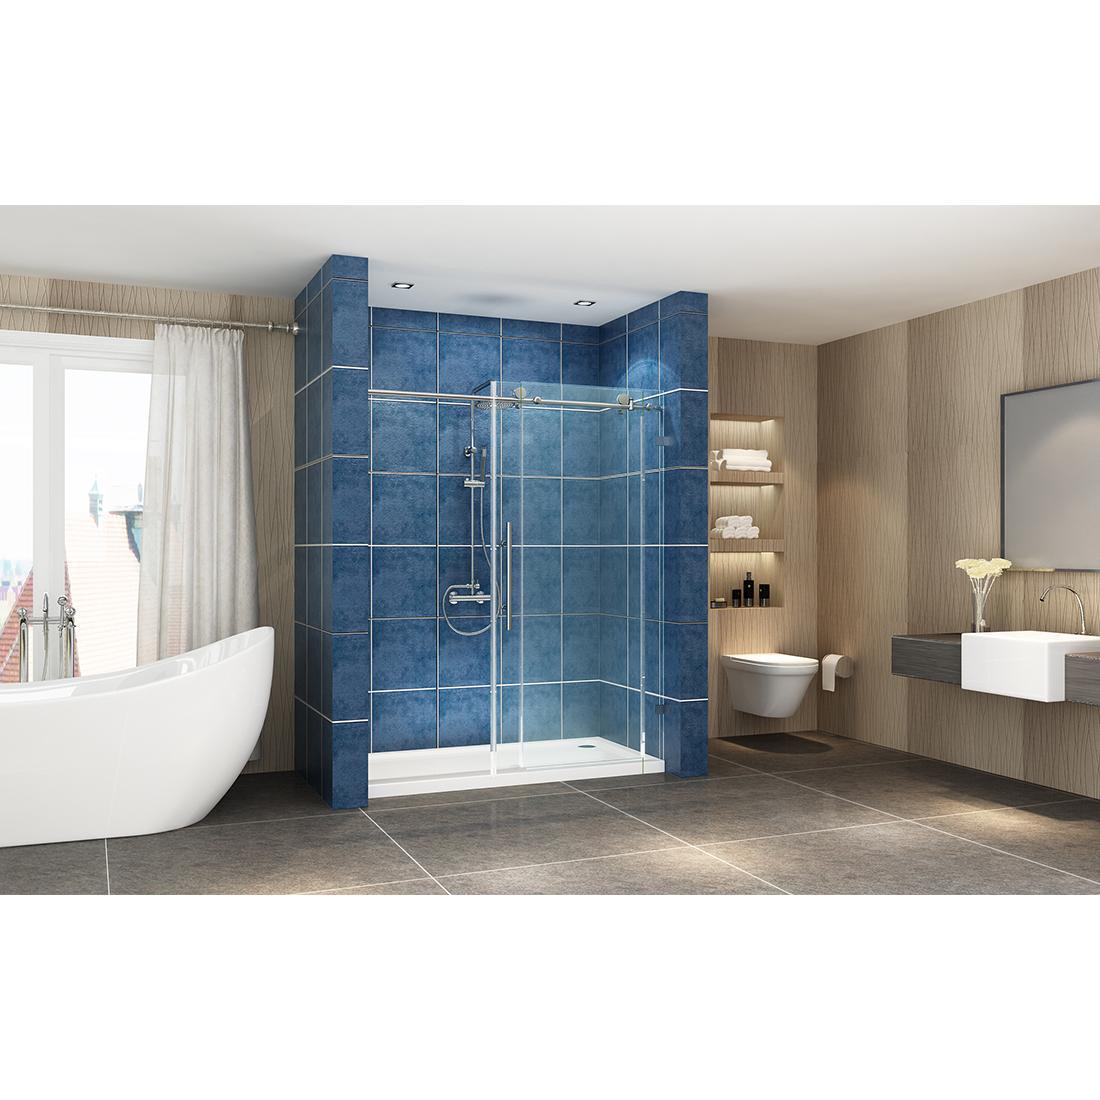 Fine 60 Shower Doors Model Bathtub Ideas